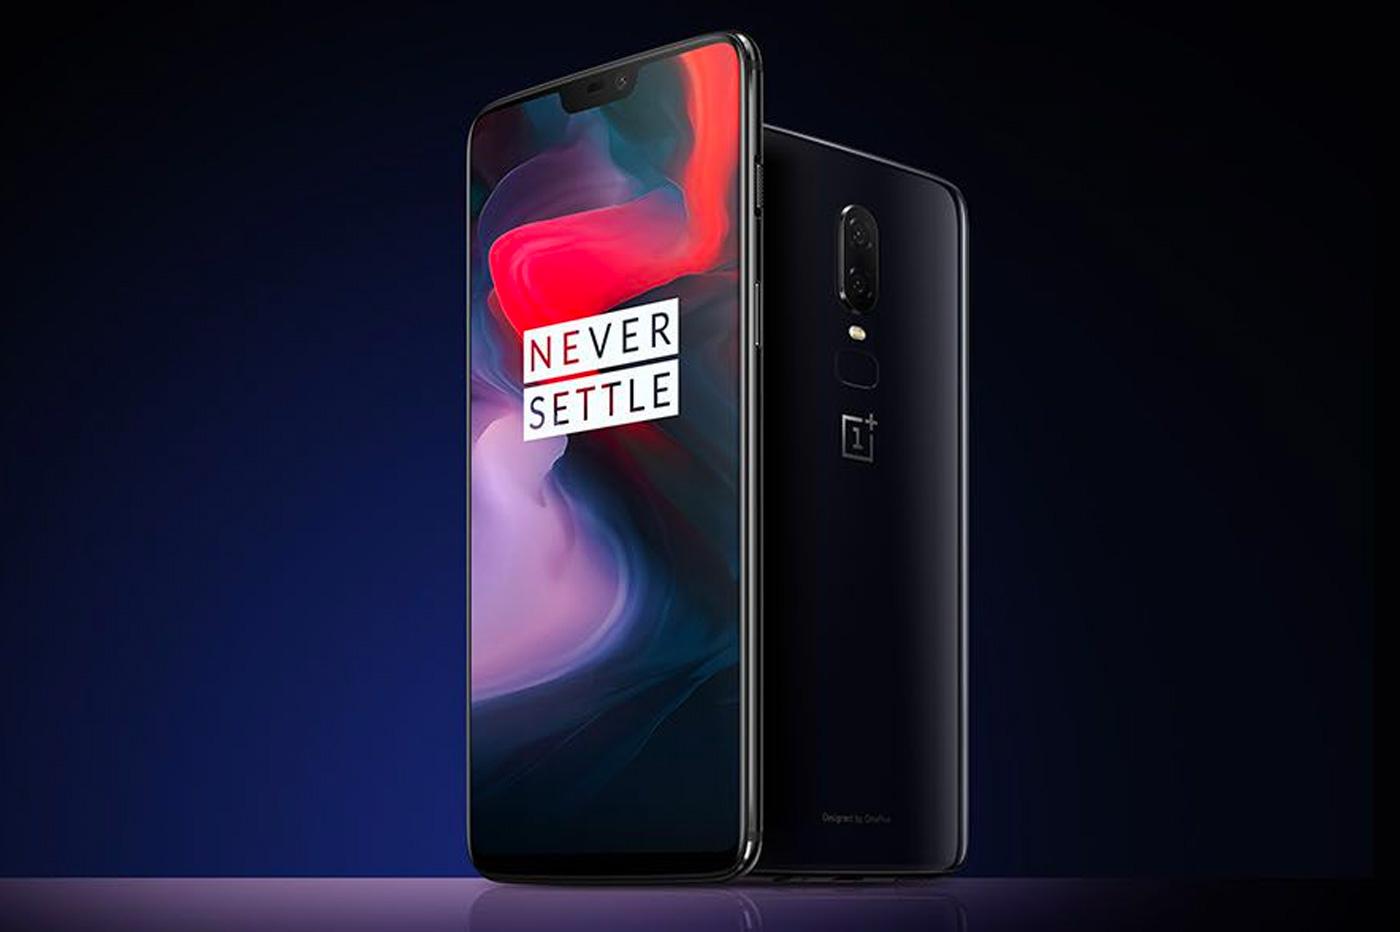 Cyber Monday 2018 : OnePlus 6 à 346 euros sur GearBest